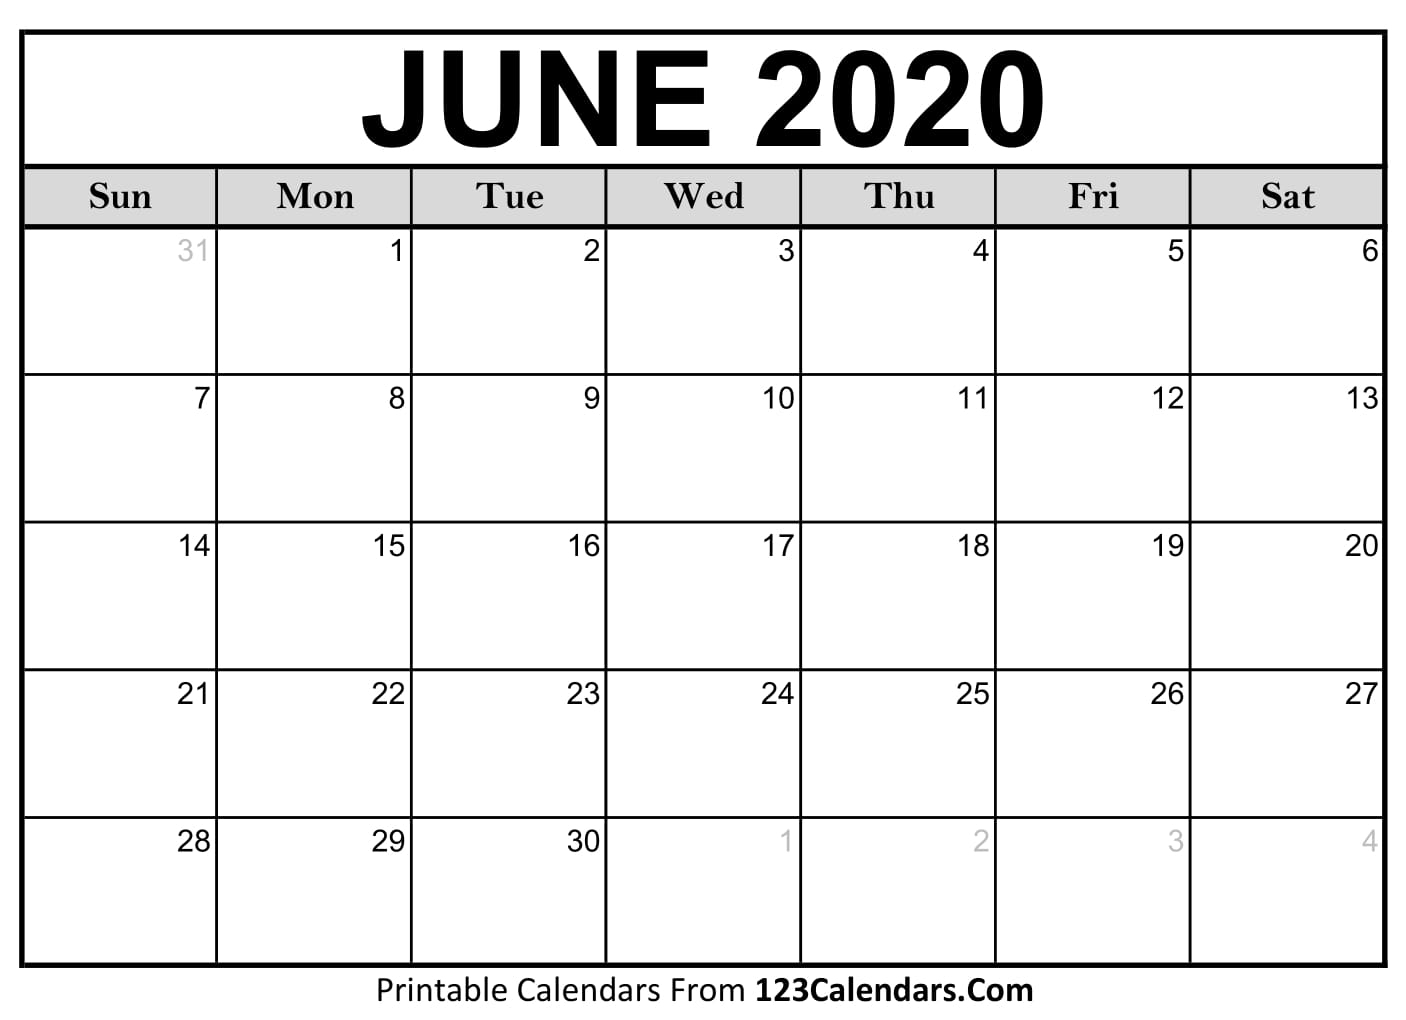 June 2020 Printable Calendar | 123Calendars with 2020 Printable Liturgical Calendar Free